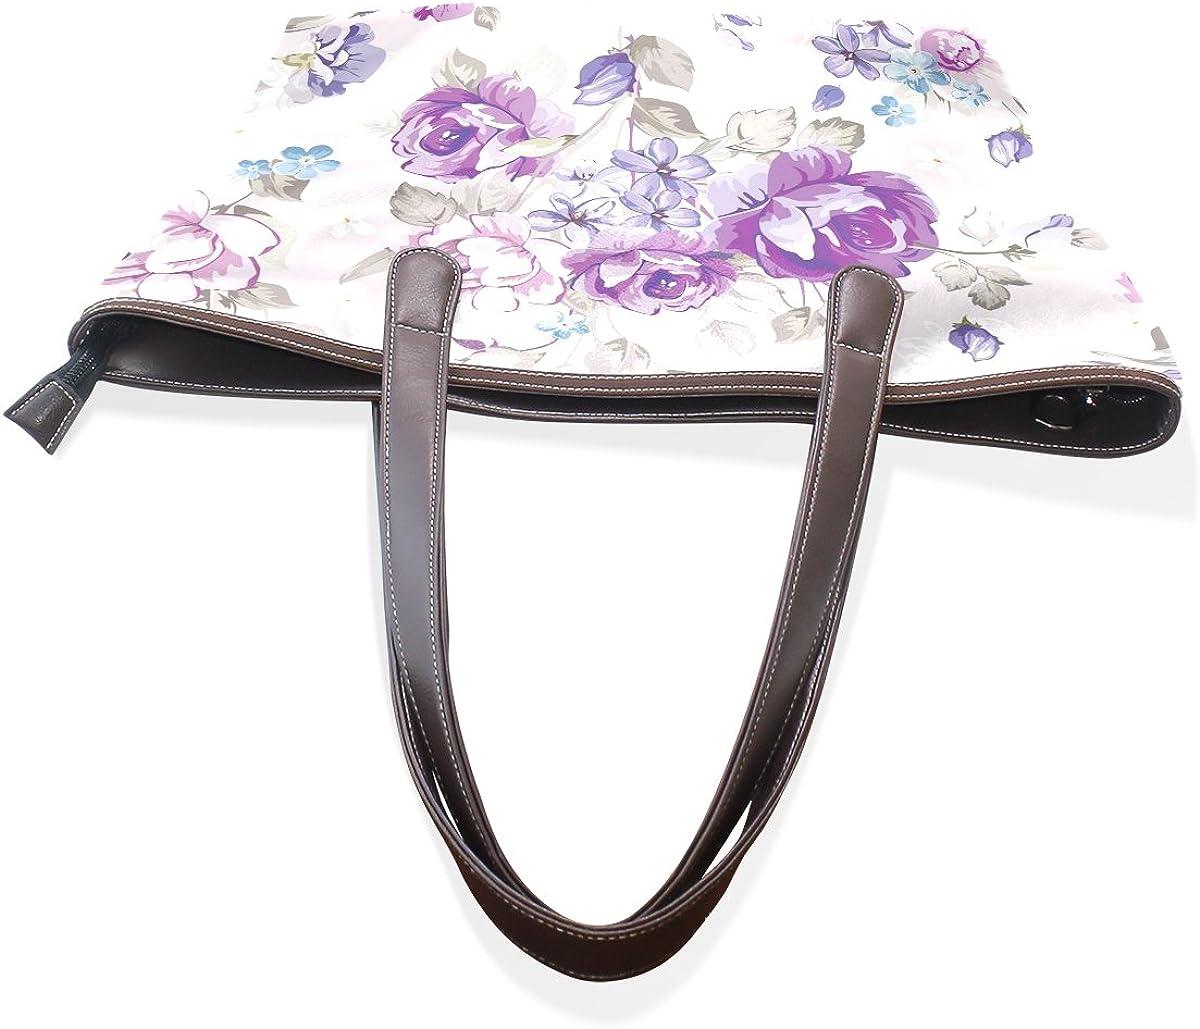 BYouLockX Leather Handbags flower Tote Satchel ShoulderBag for Women